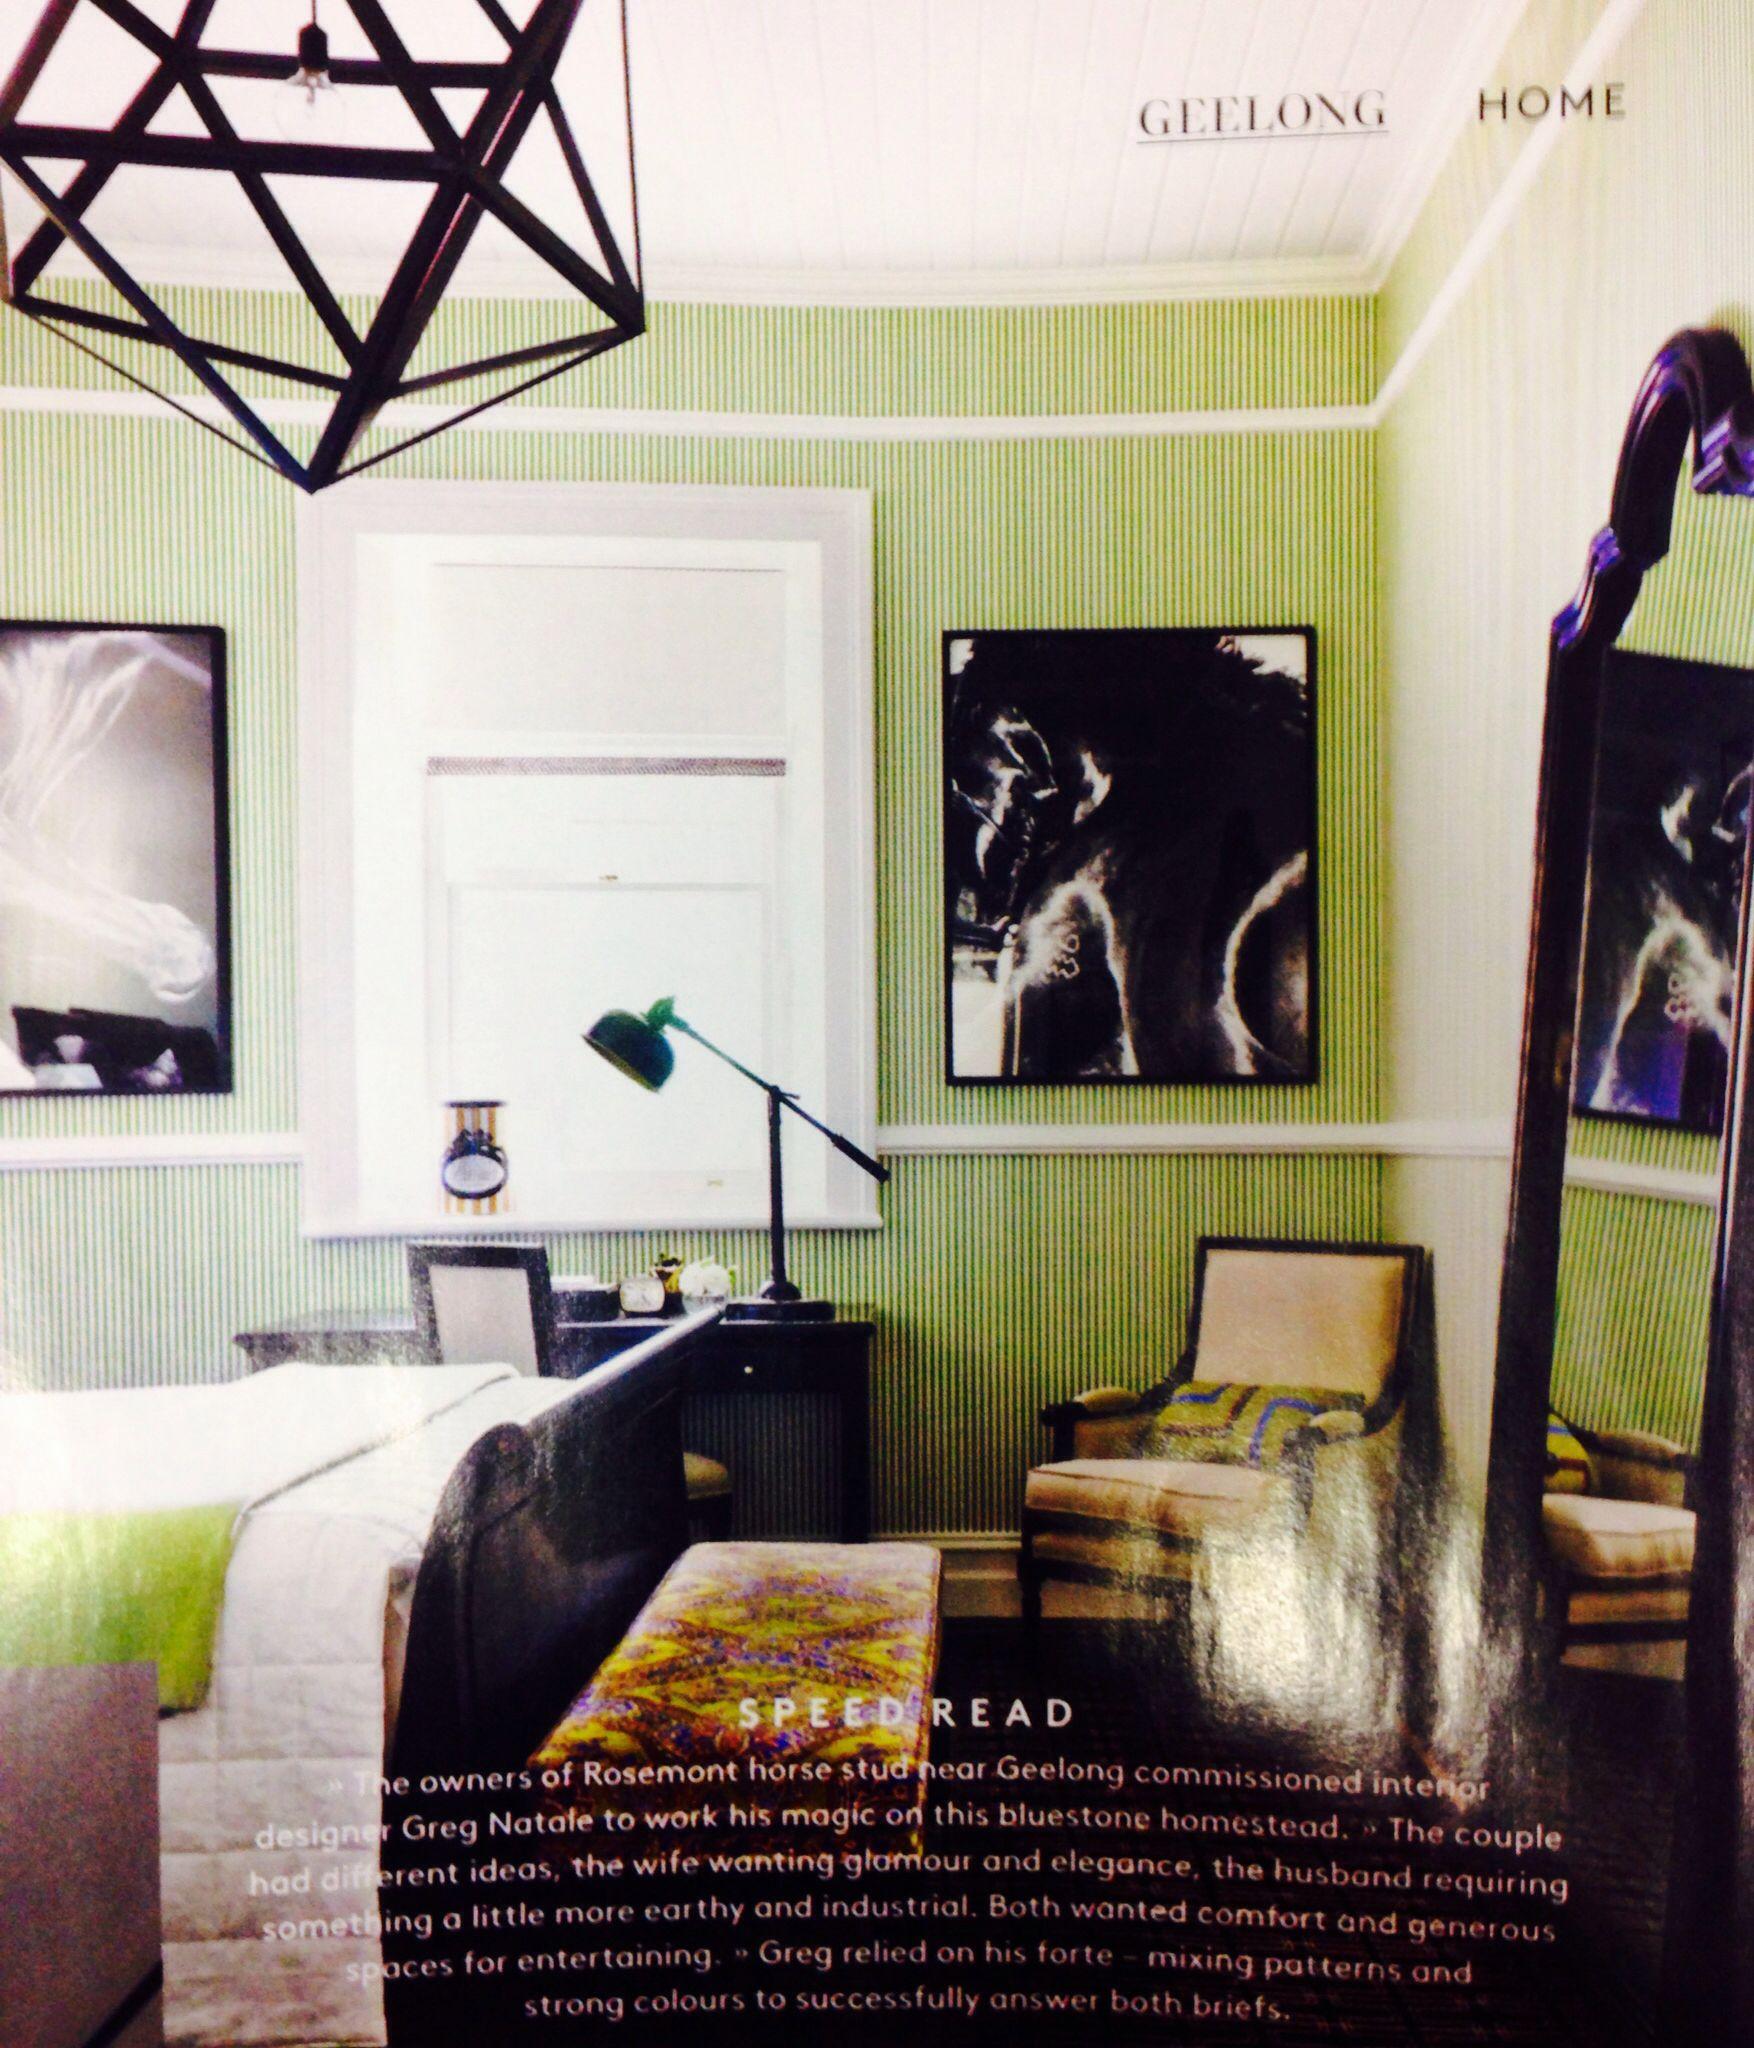 Geelong Home By Greg Natale As Seen In Belle Mag